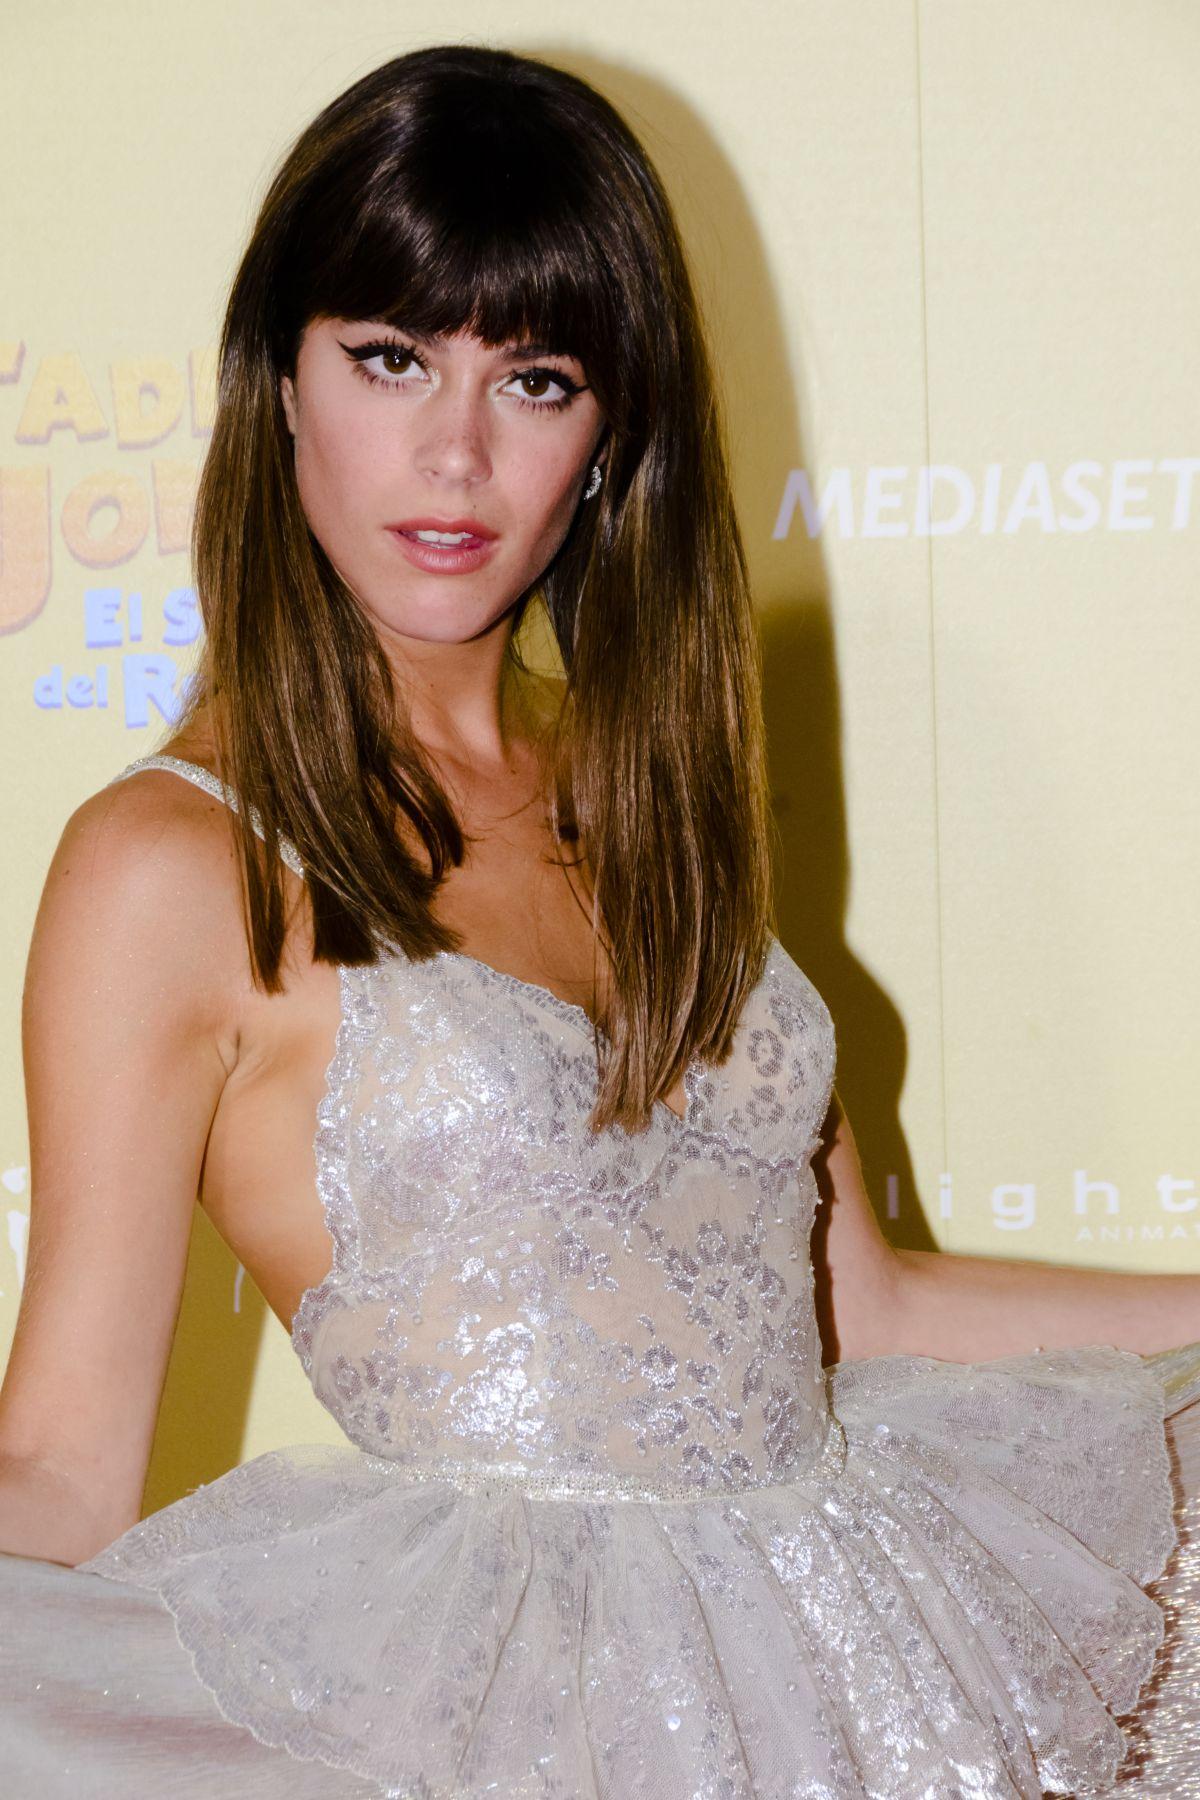 MARTINA STOESSEL At Tadeo Jones 2 Premier In Madrid 0822